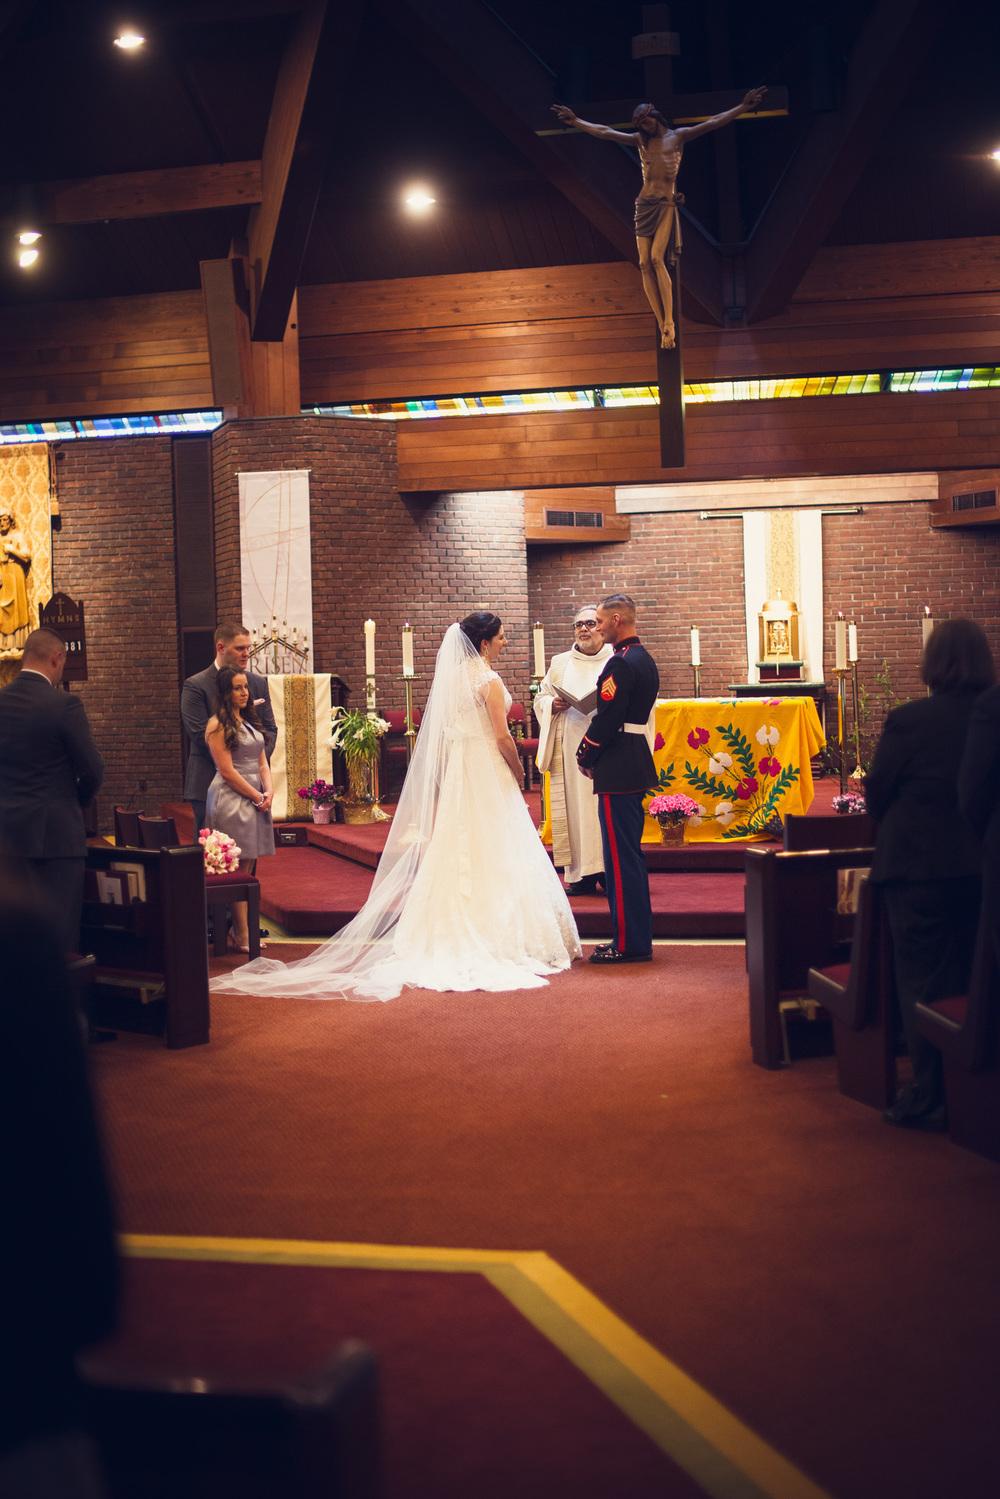 bride groom marine alter wedding ceremony church portrait THPHOTO